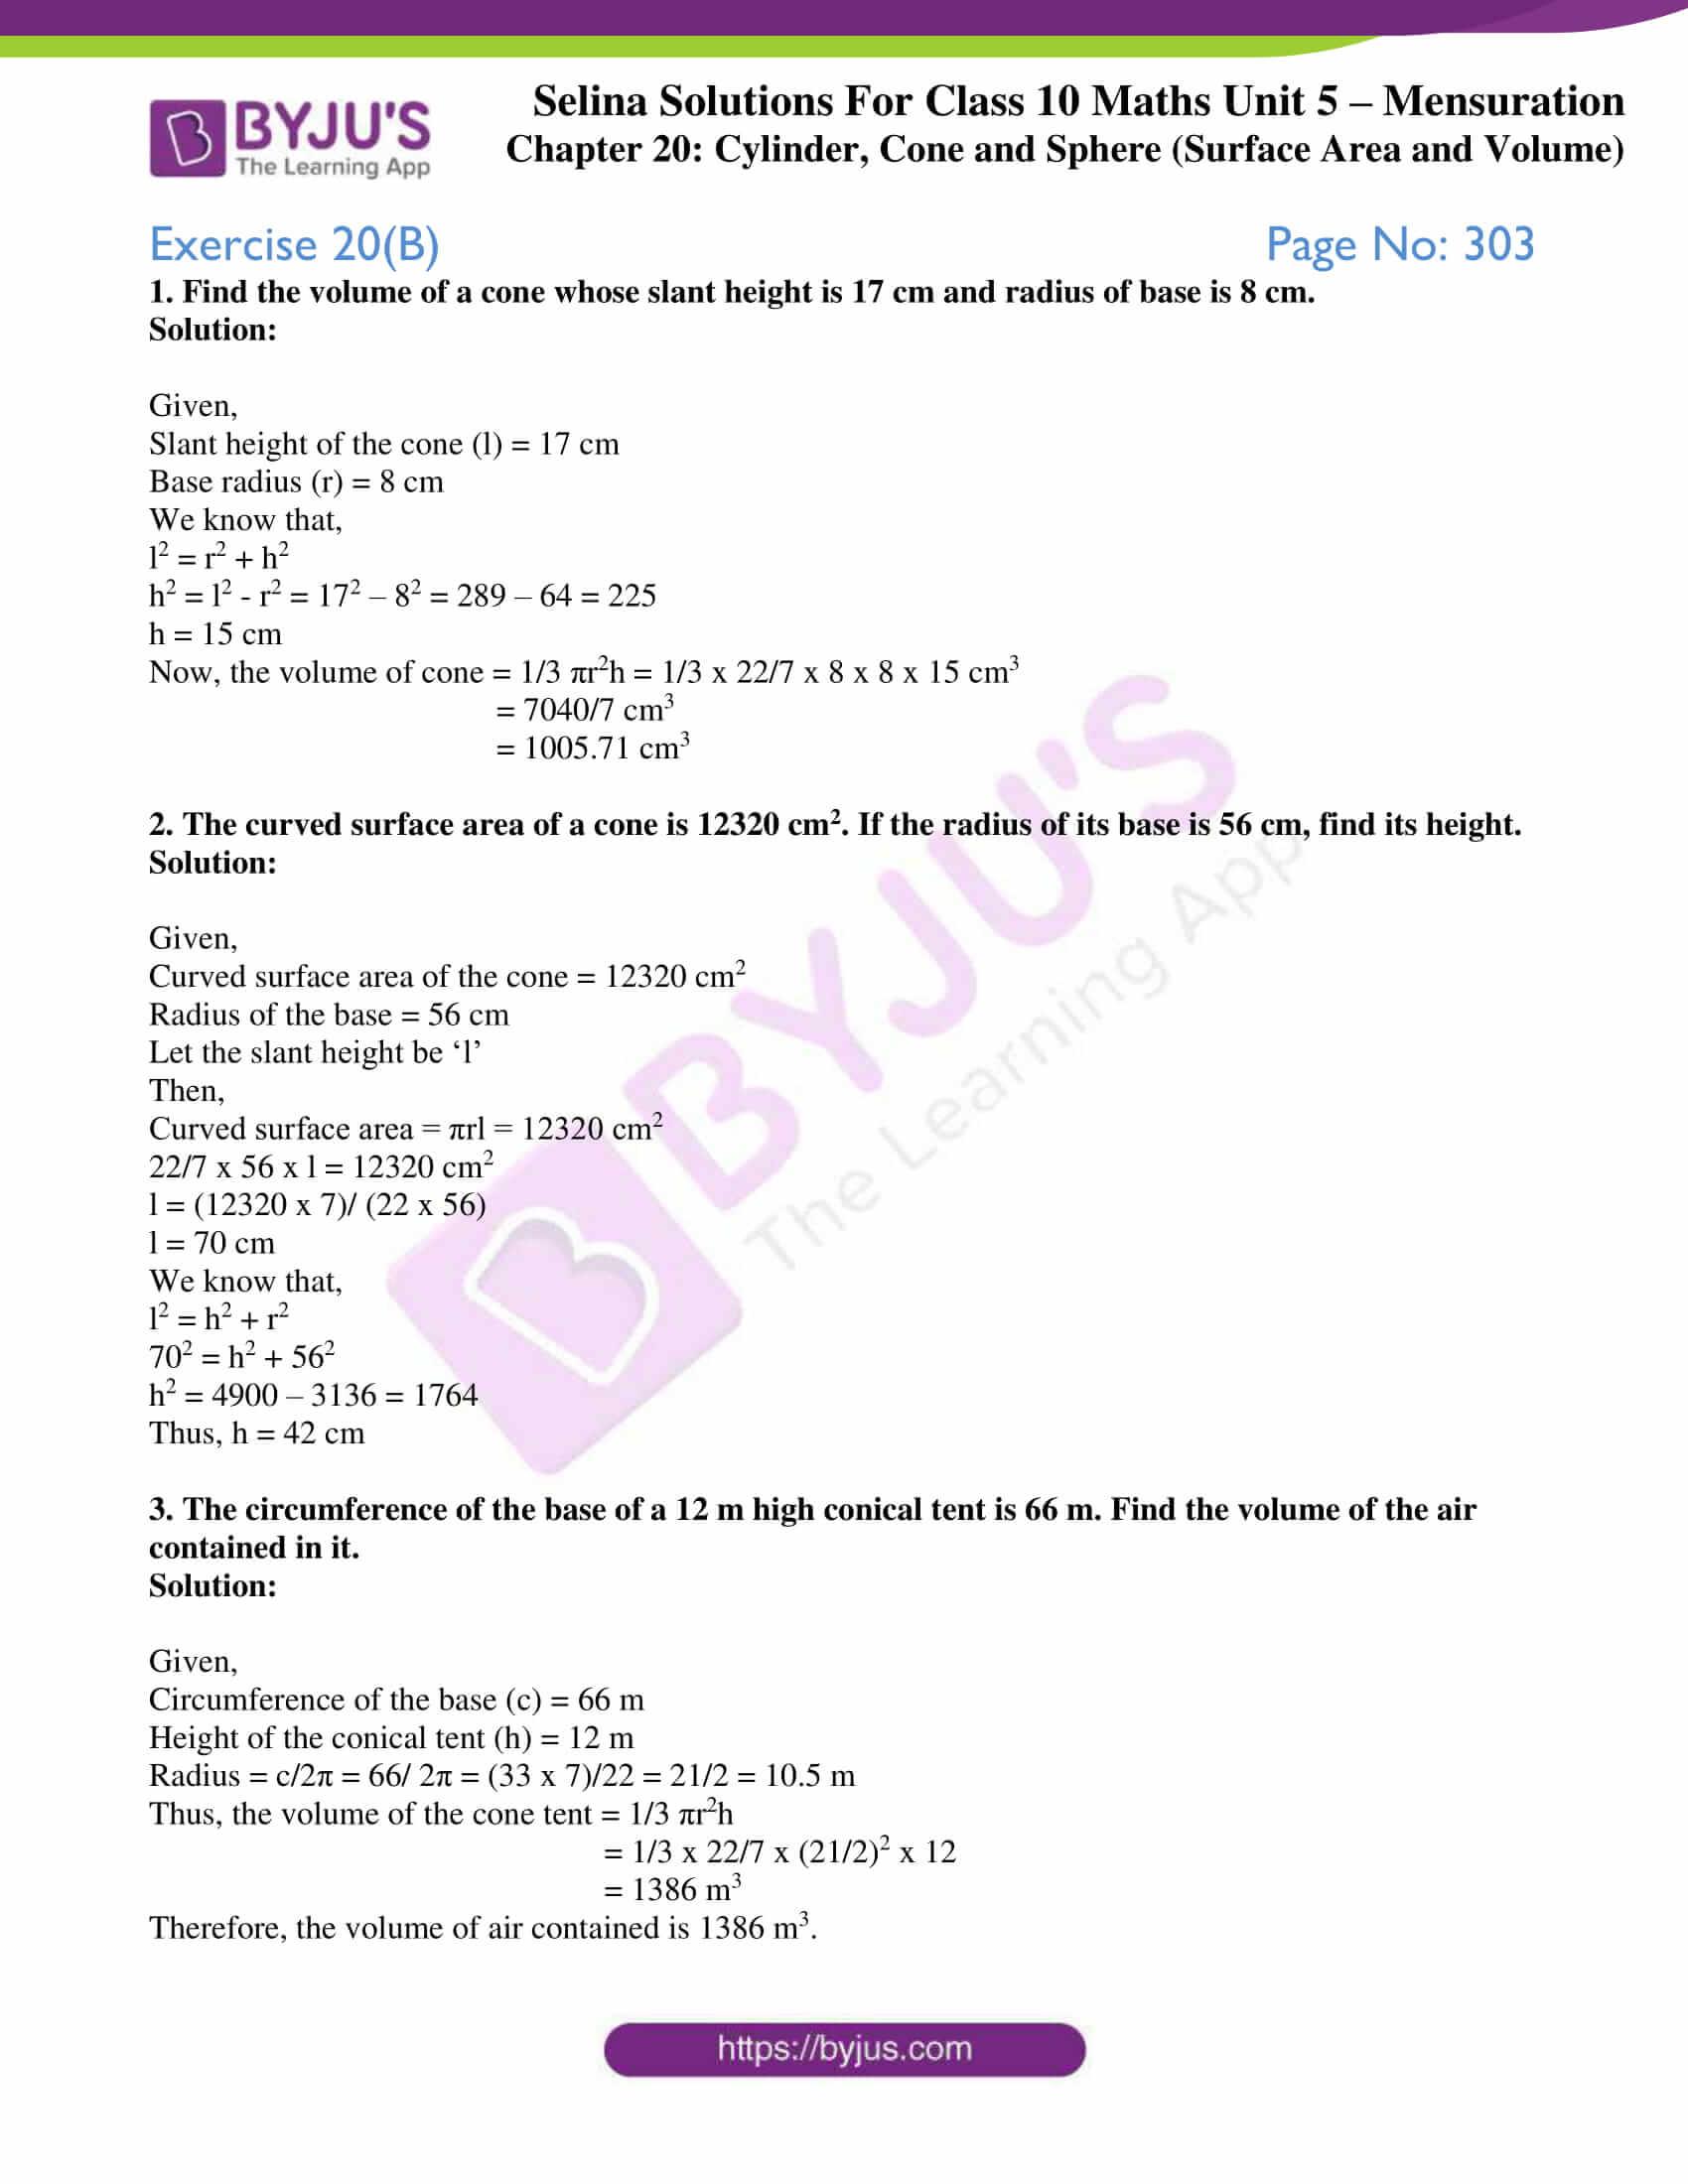 selina-sol-maths-class-10-ch-20-ex-b-1